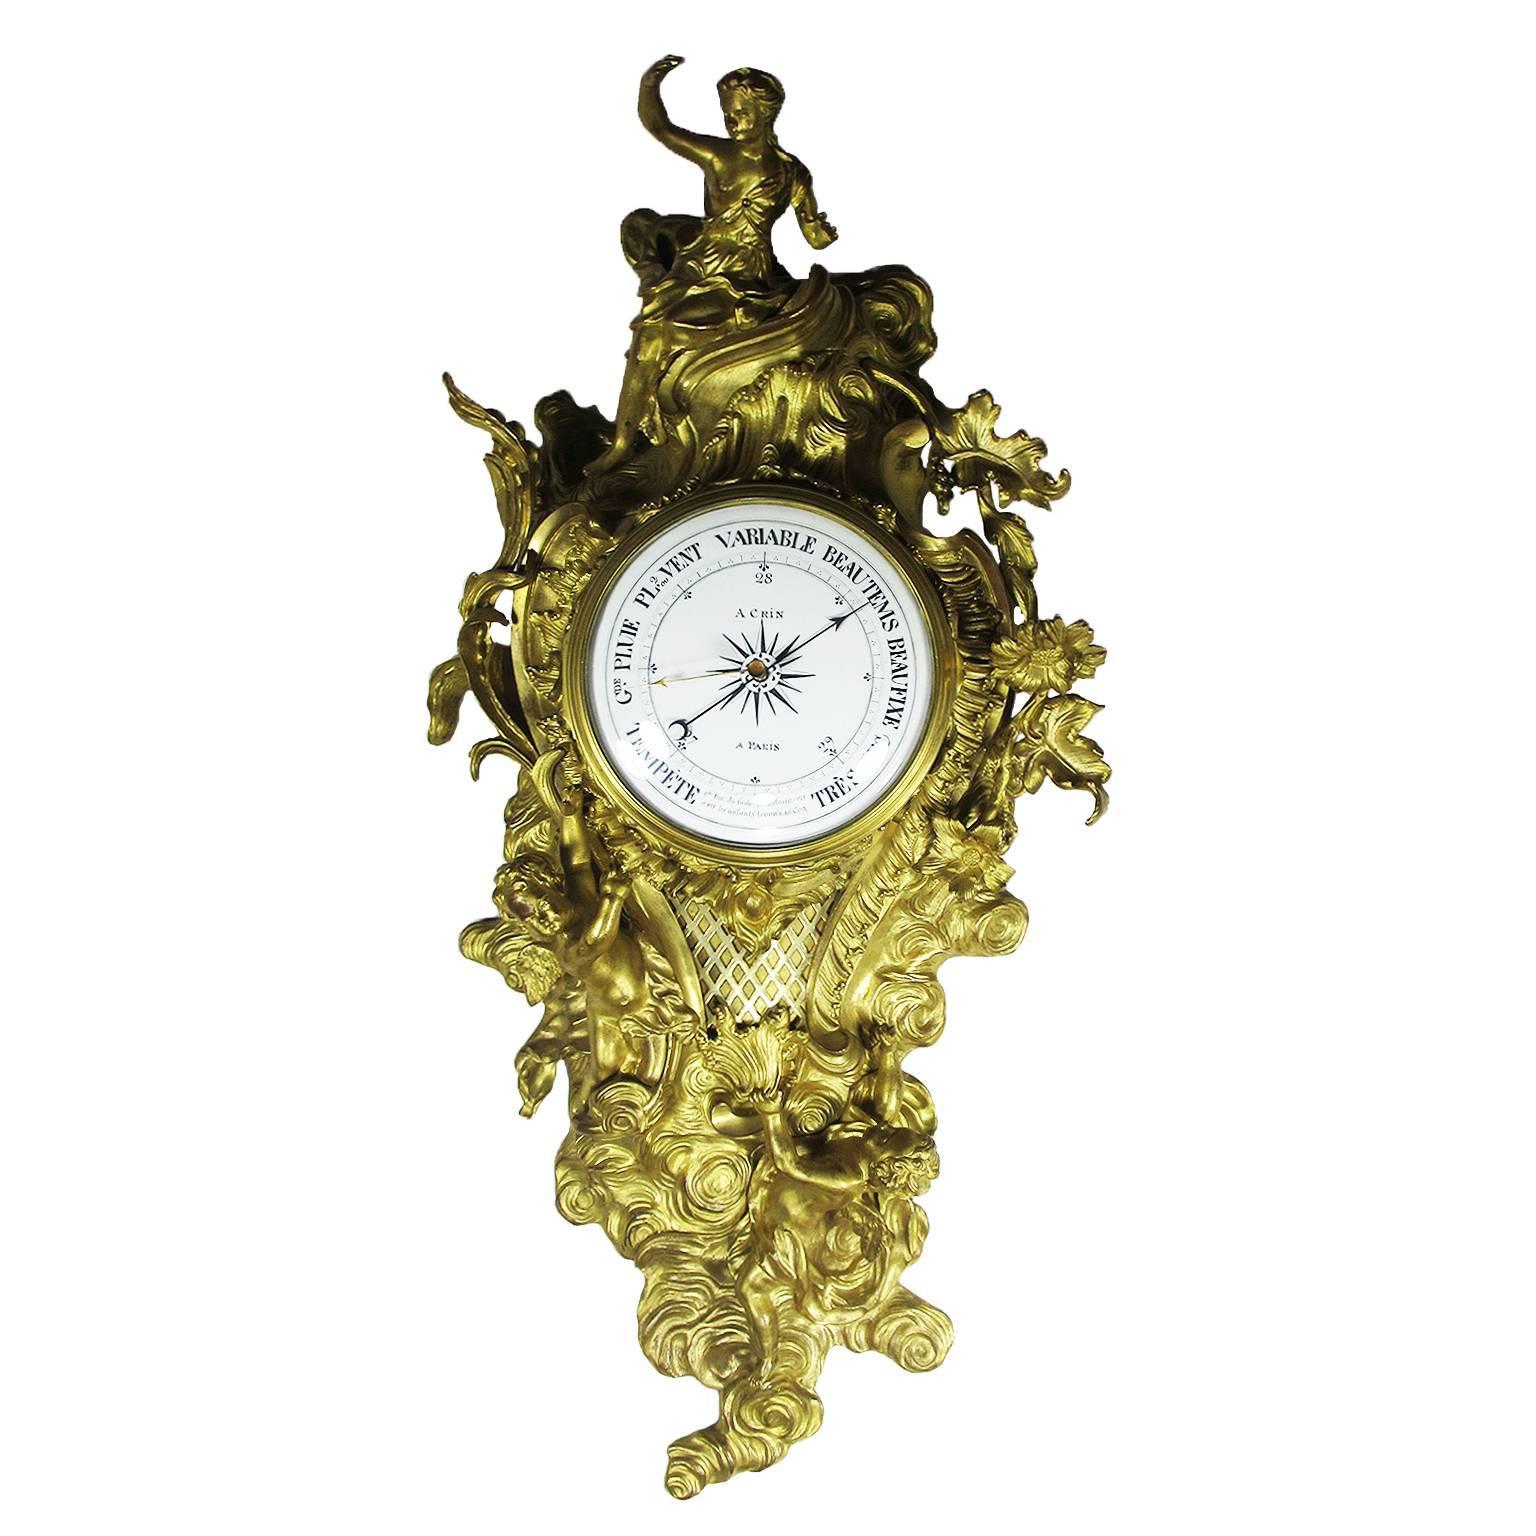 19th Century Louis XV Style Gilt-Bronze Cartel Barometer by A. Crin, a Paris